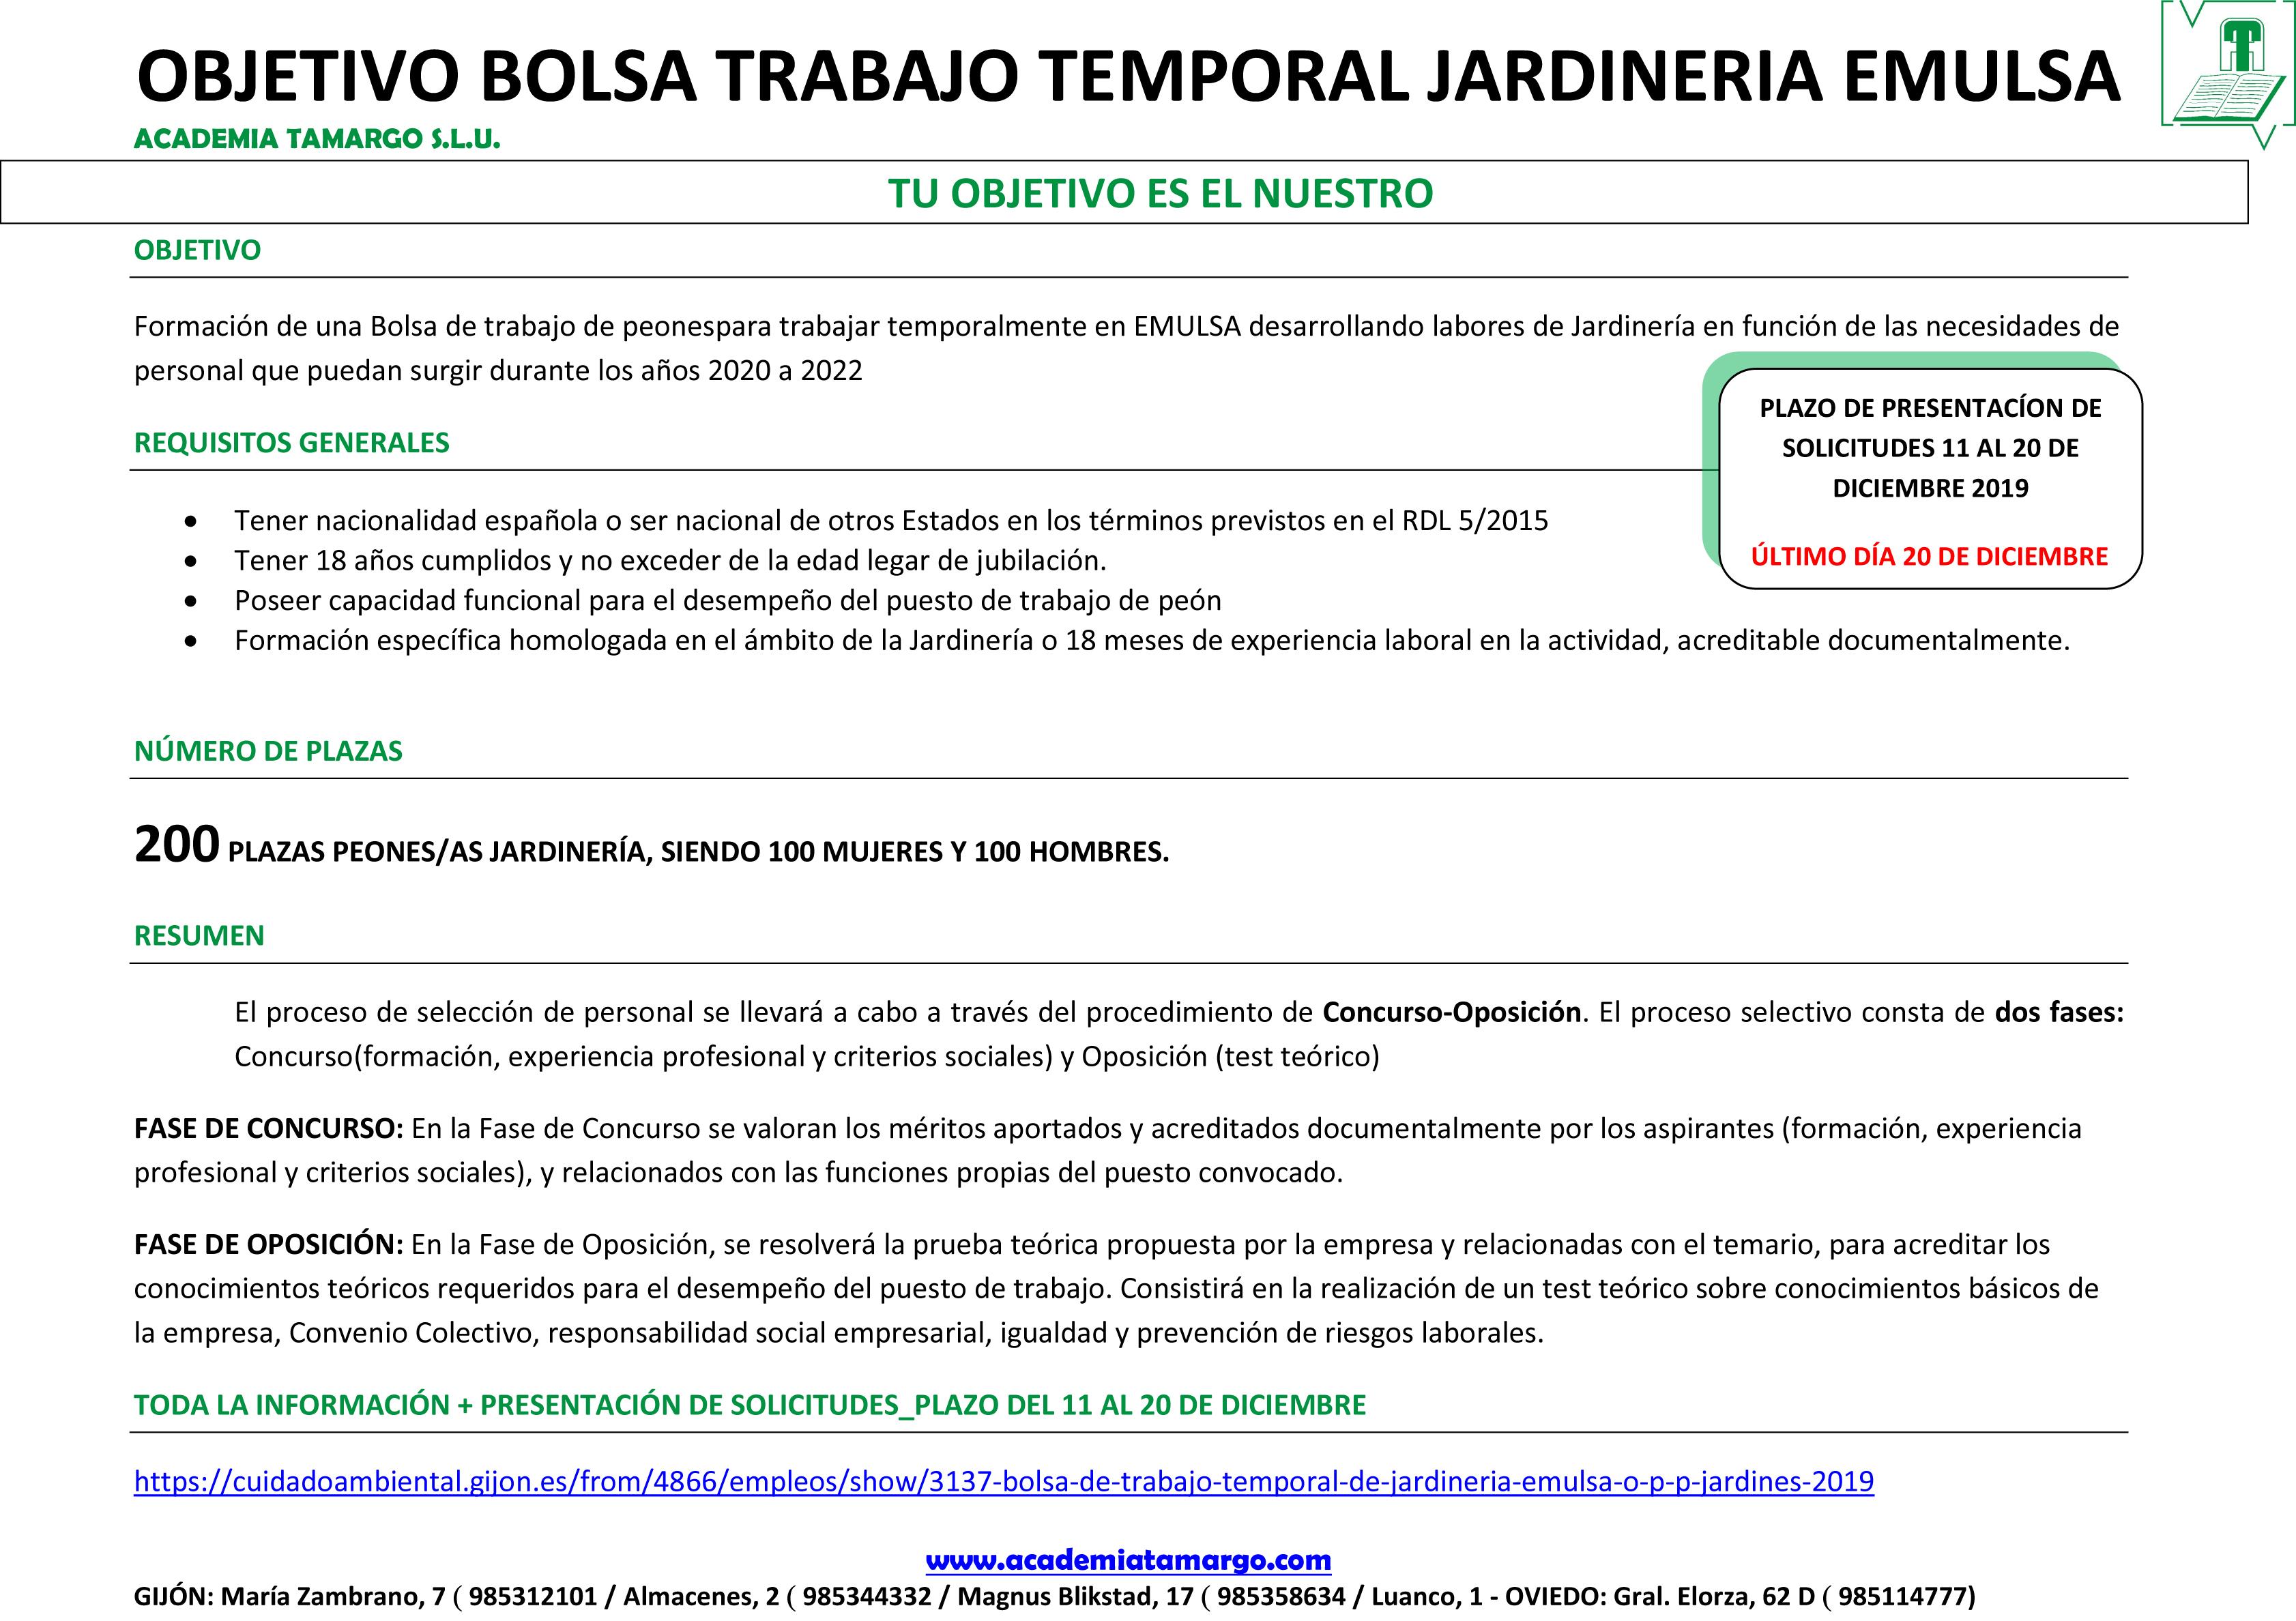 Microsoft Word – OBJETIVO PROCESO SELECTIVO BOLSA EMULSA.docx